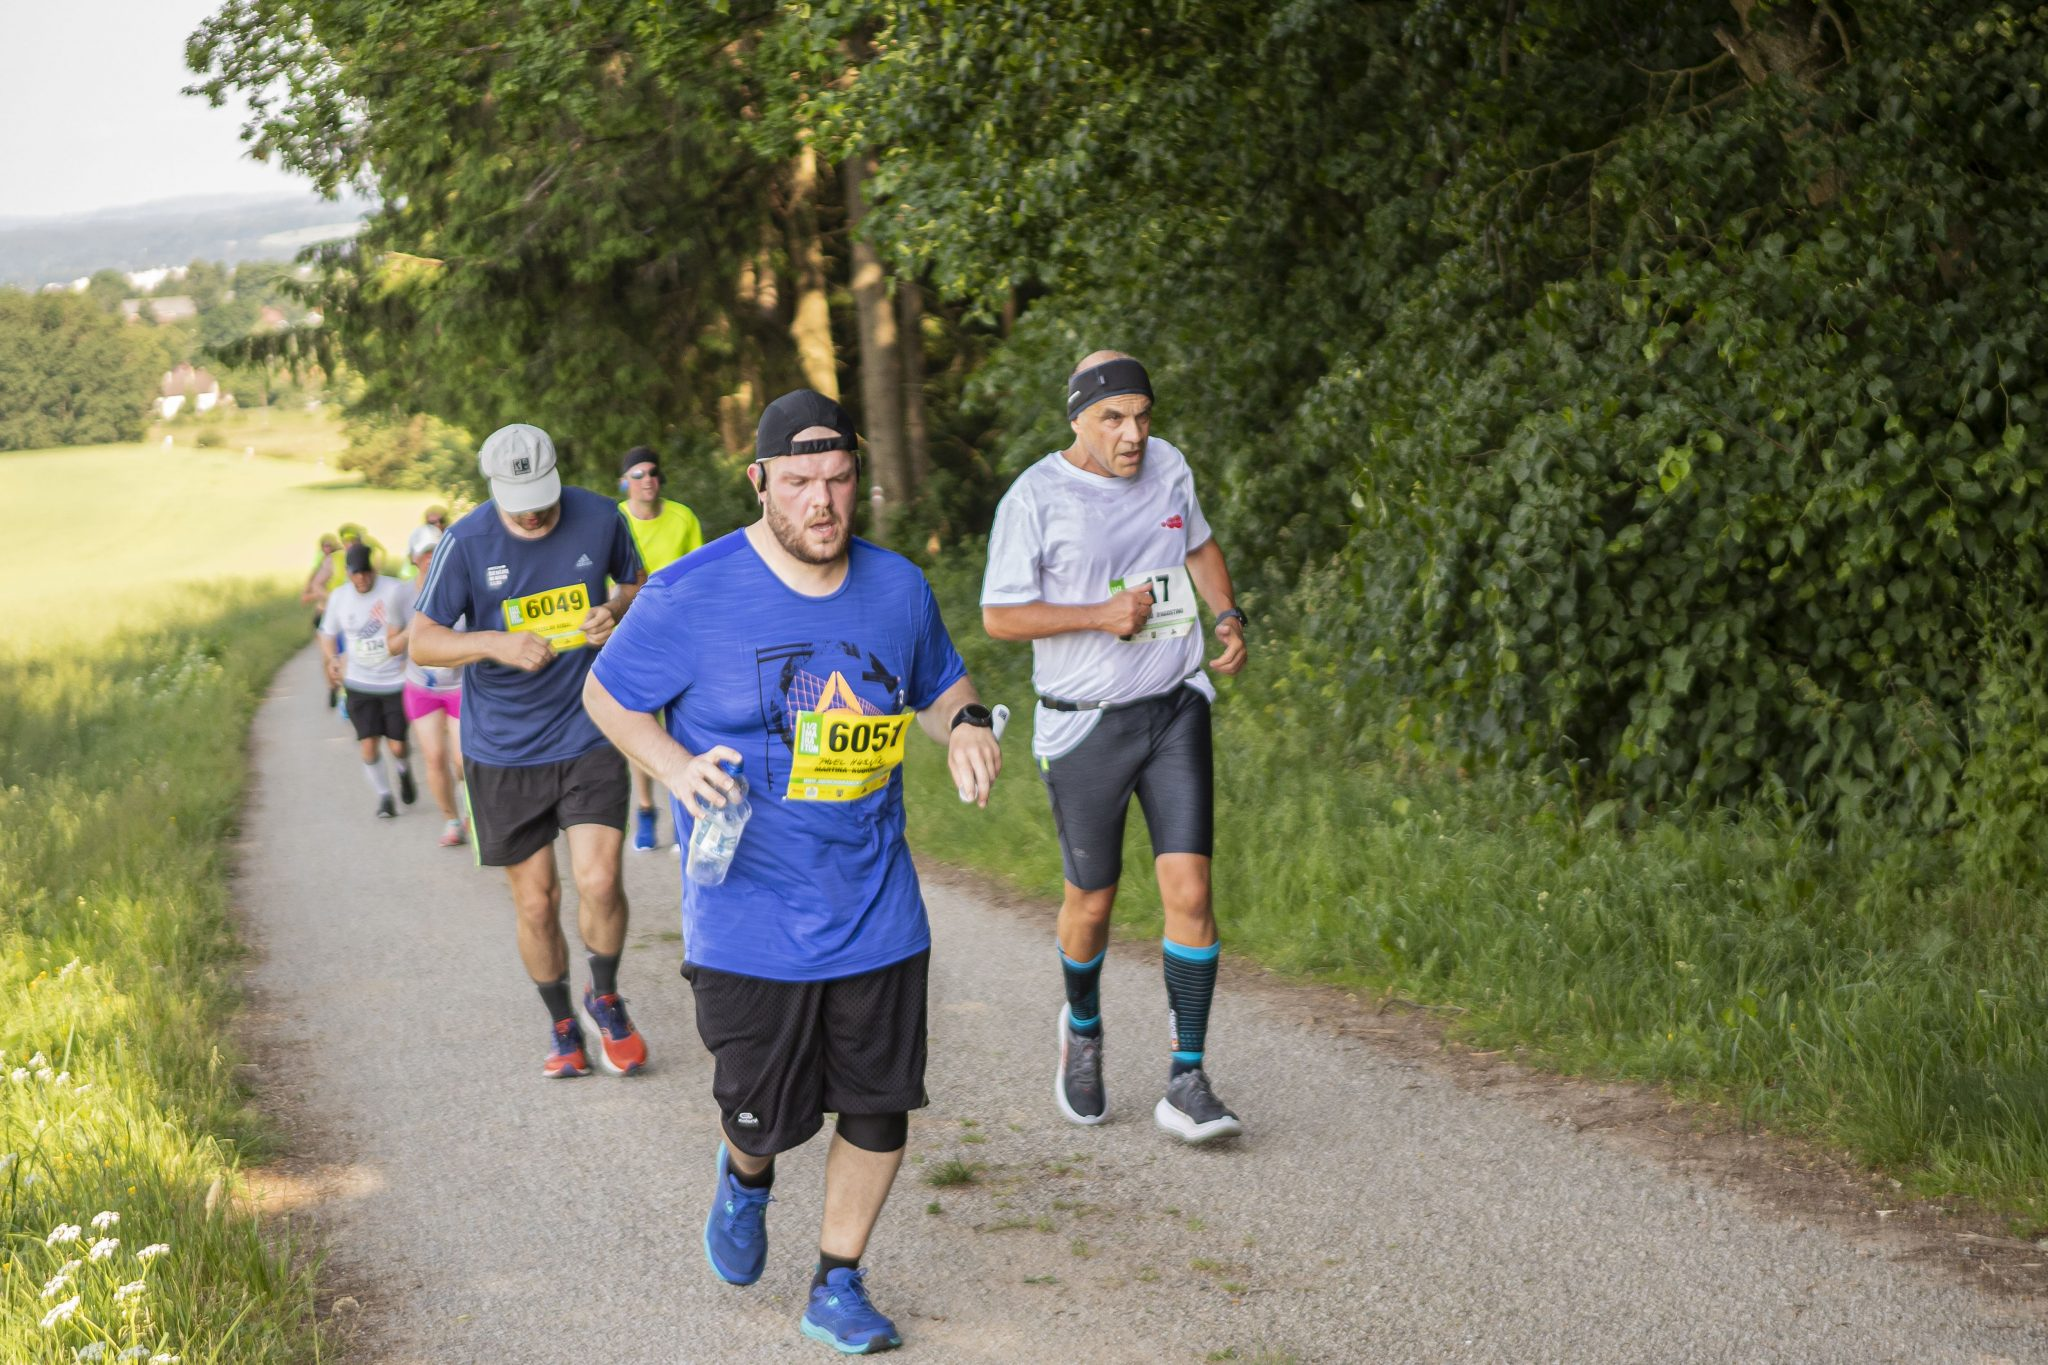 Jindřichohradecký půlmaraton - Tecnocap hrdý sponzor